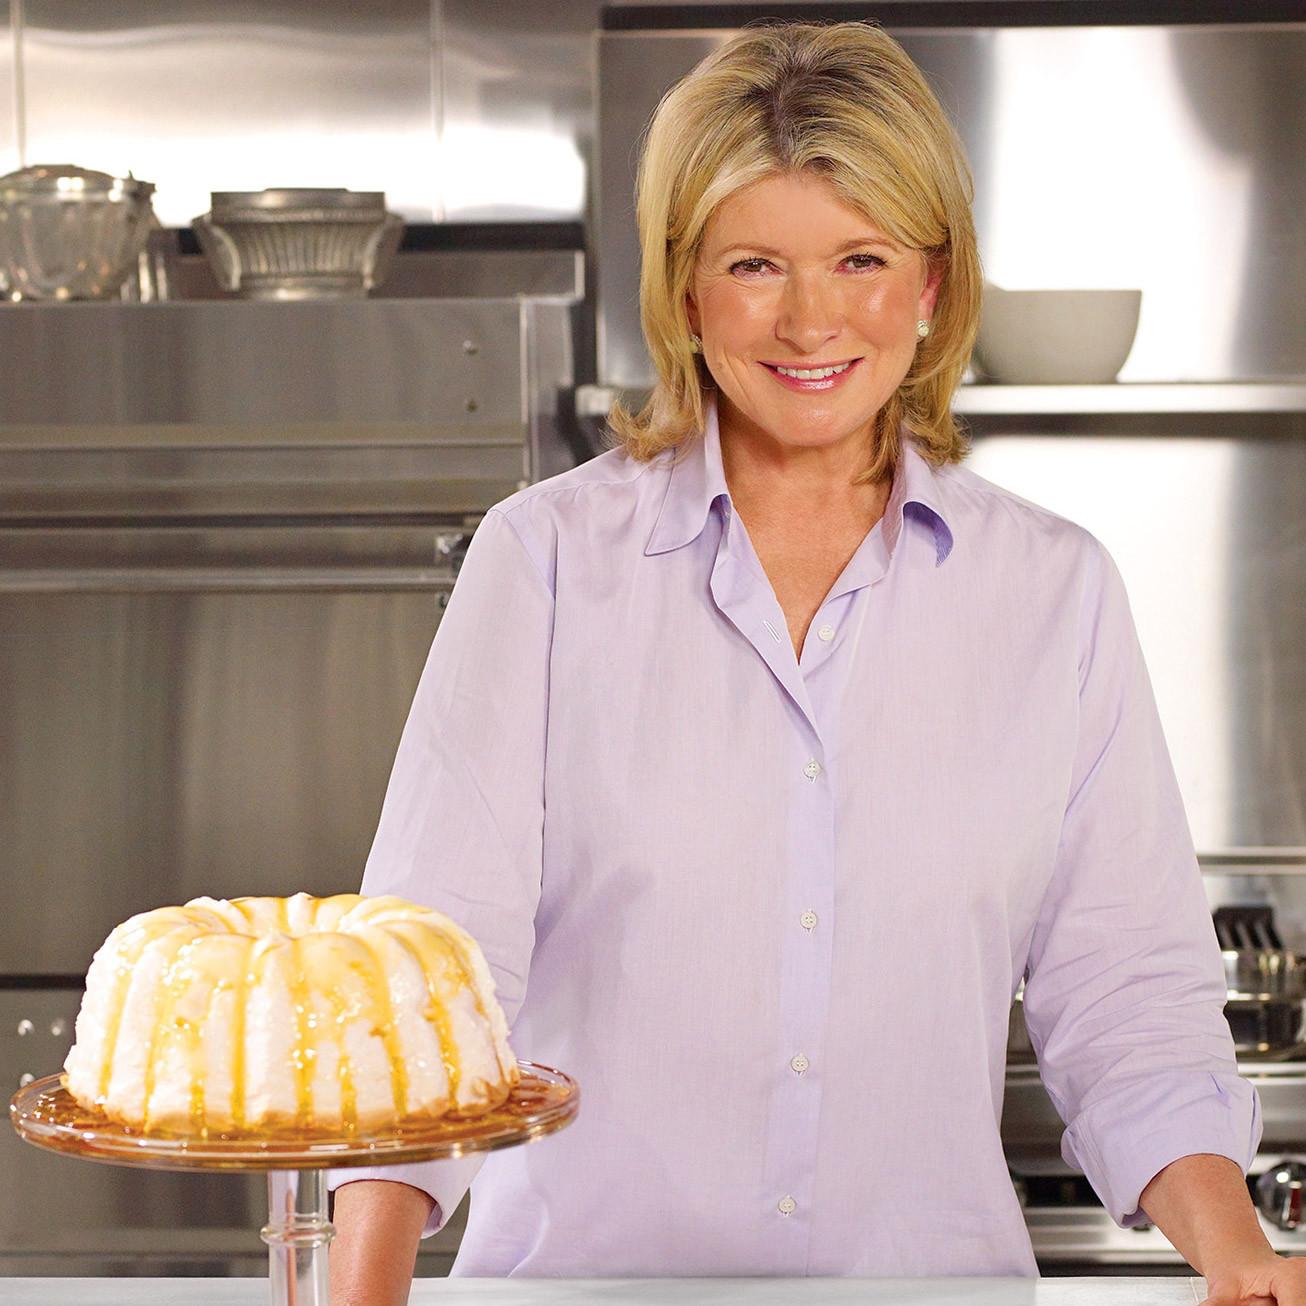 Marthastuart Marthastuart: Martha's Birthday Cake Was This Spectacular French Dessert